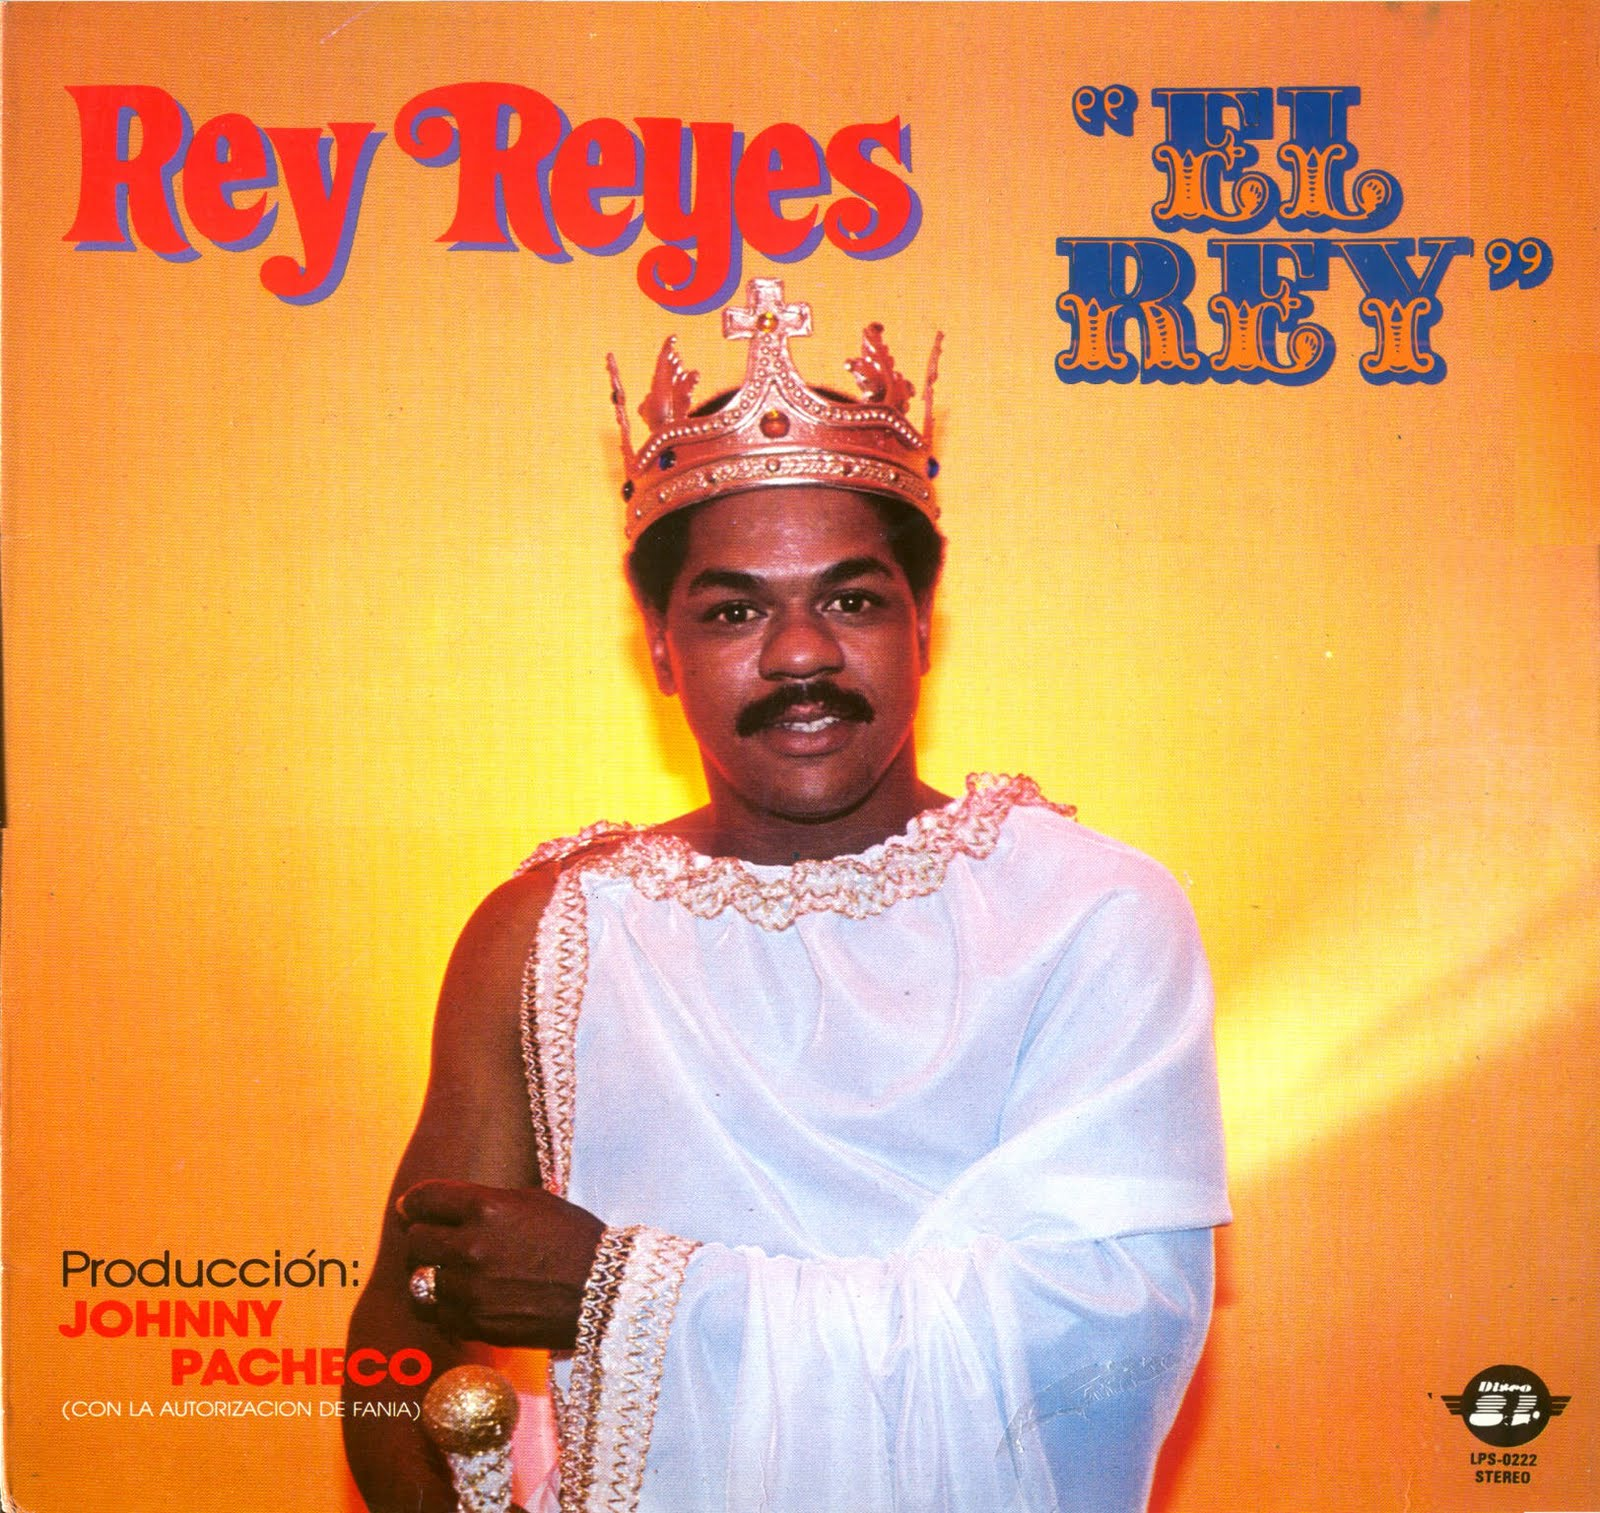 Rey Reyes Nude Photos 28